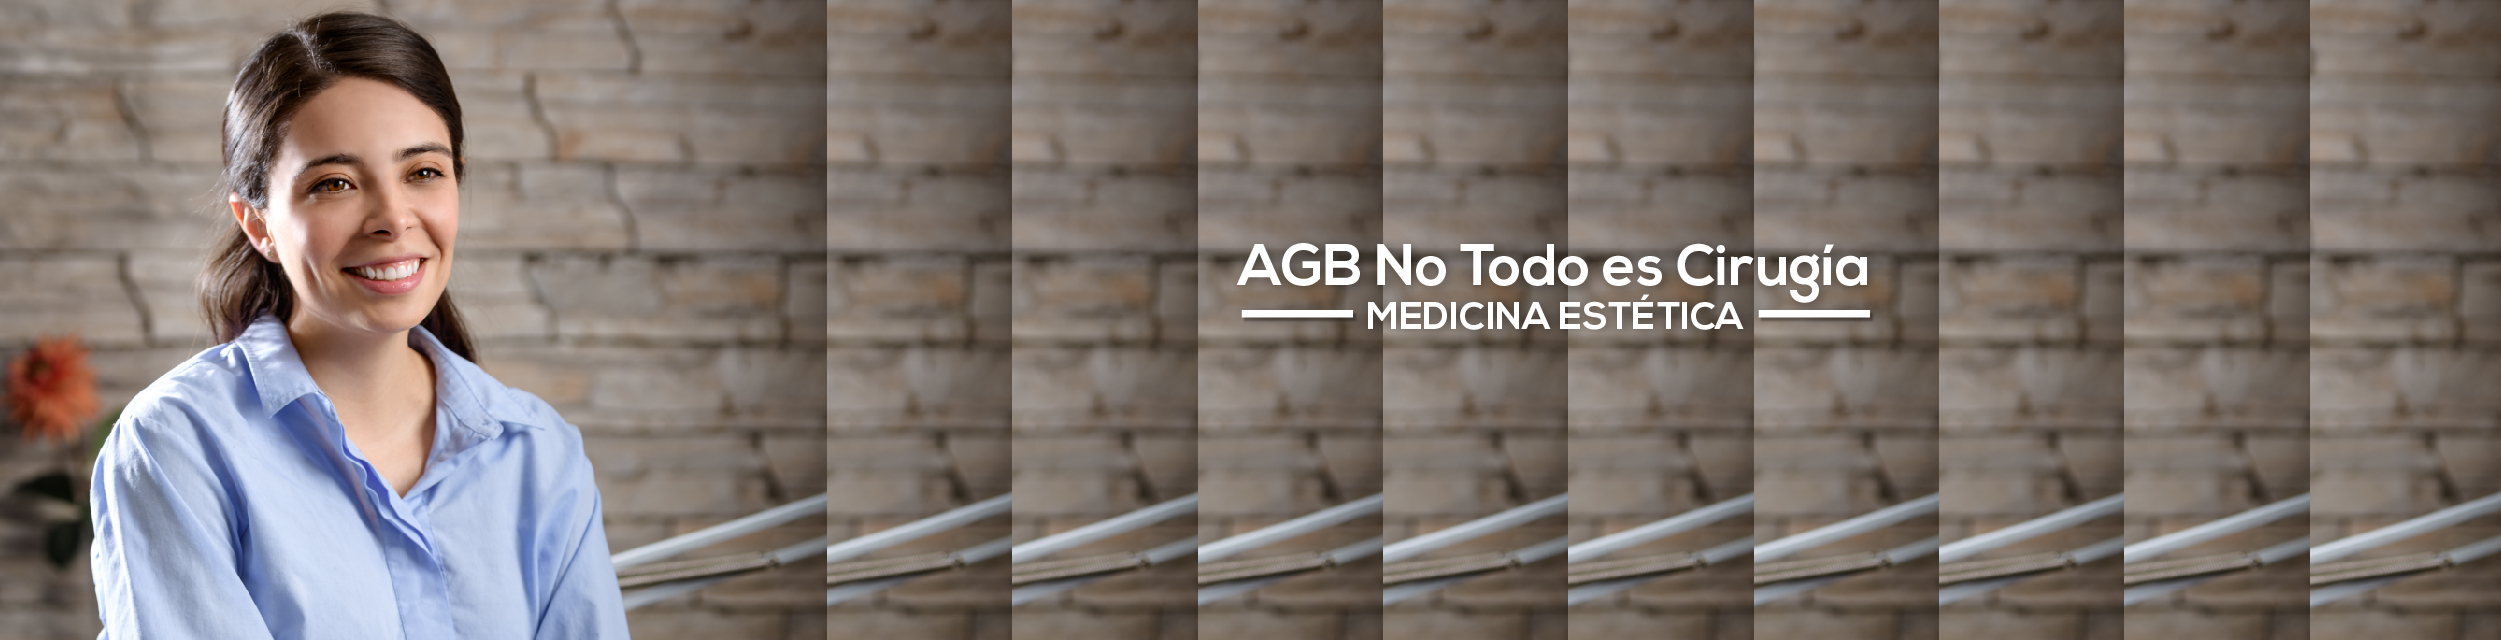 banner-arriba2-01